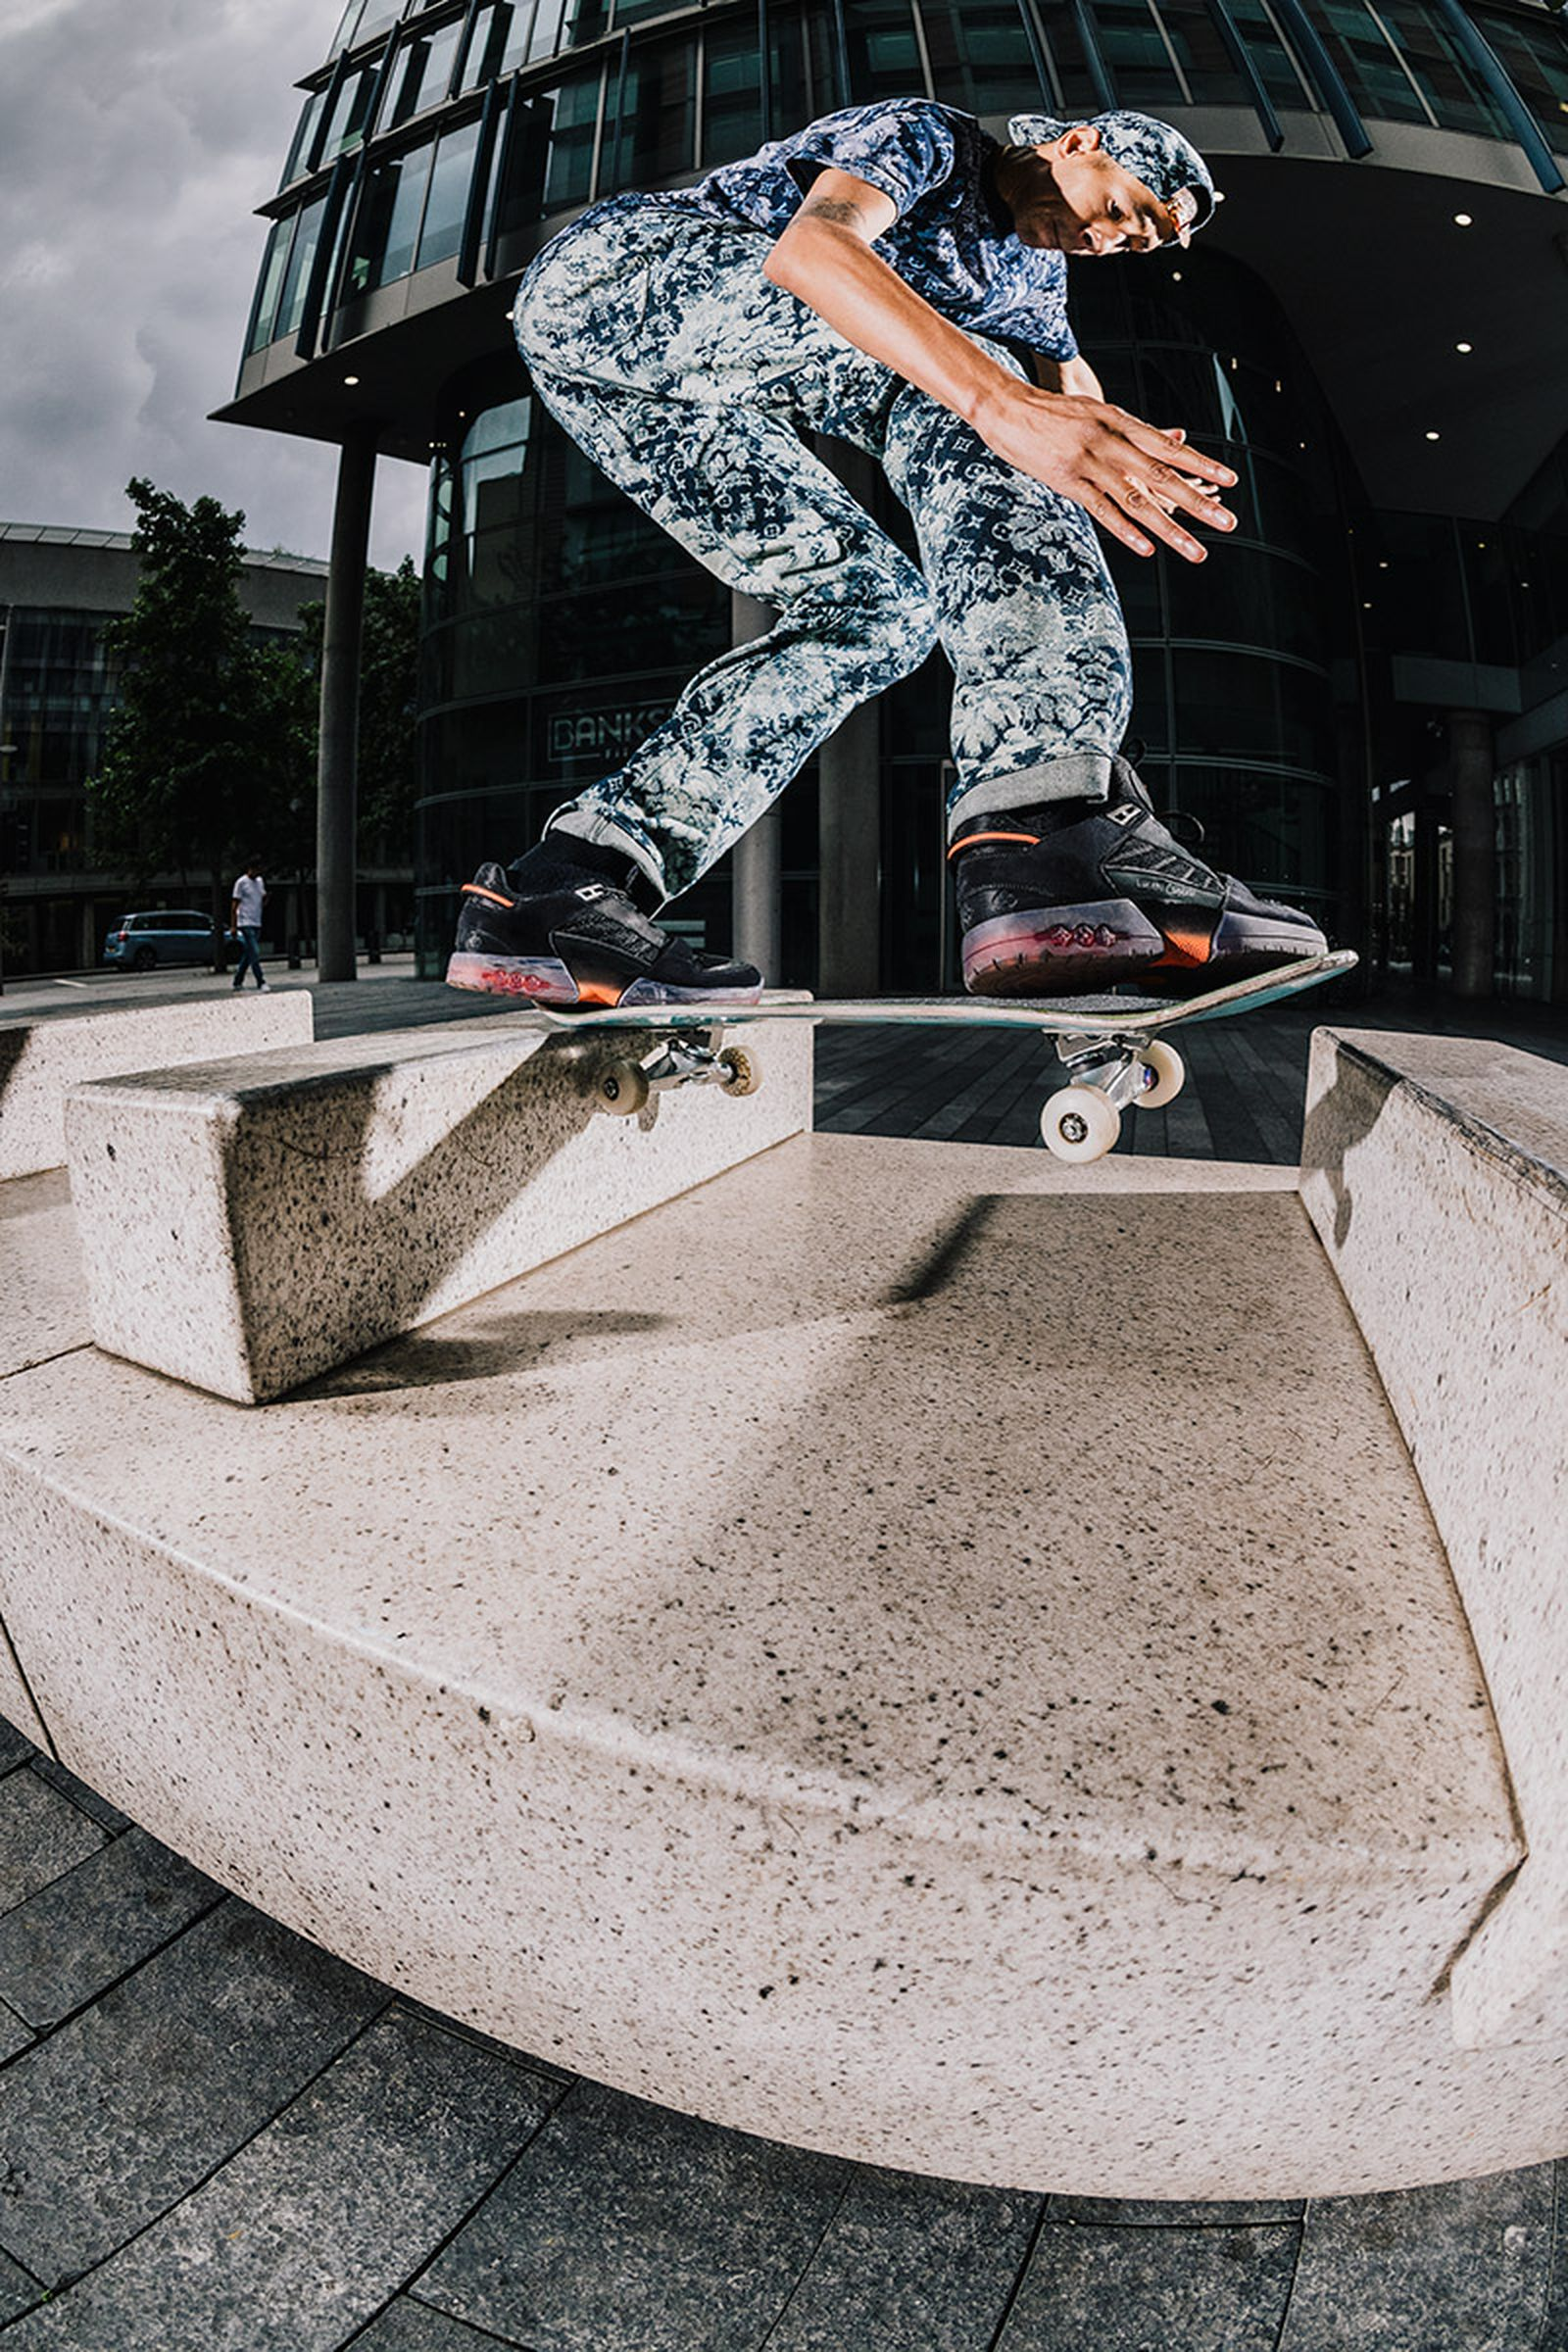 lucien-clarke-louis-vuitton-skate-shoe-release-date-price-02